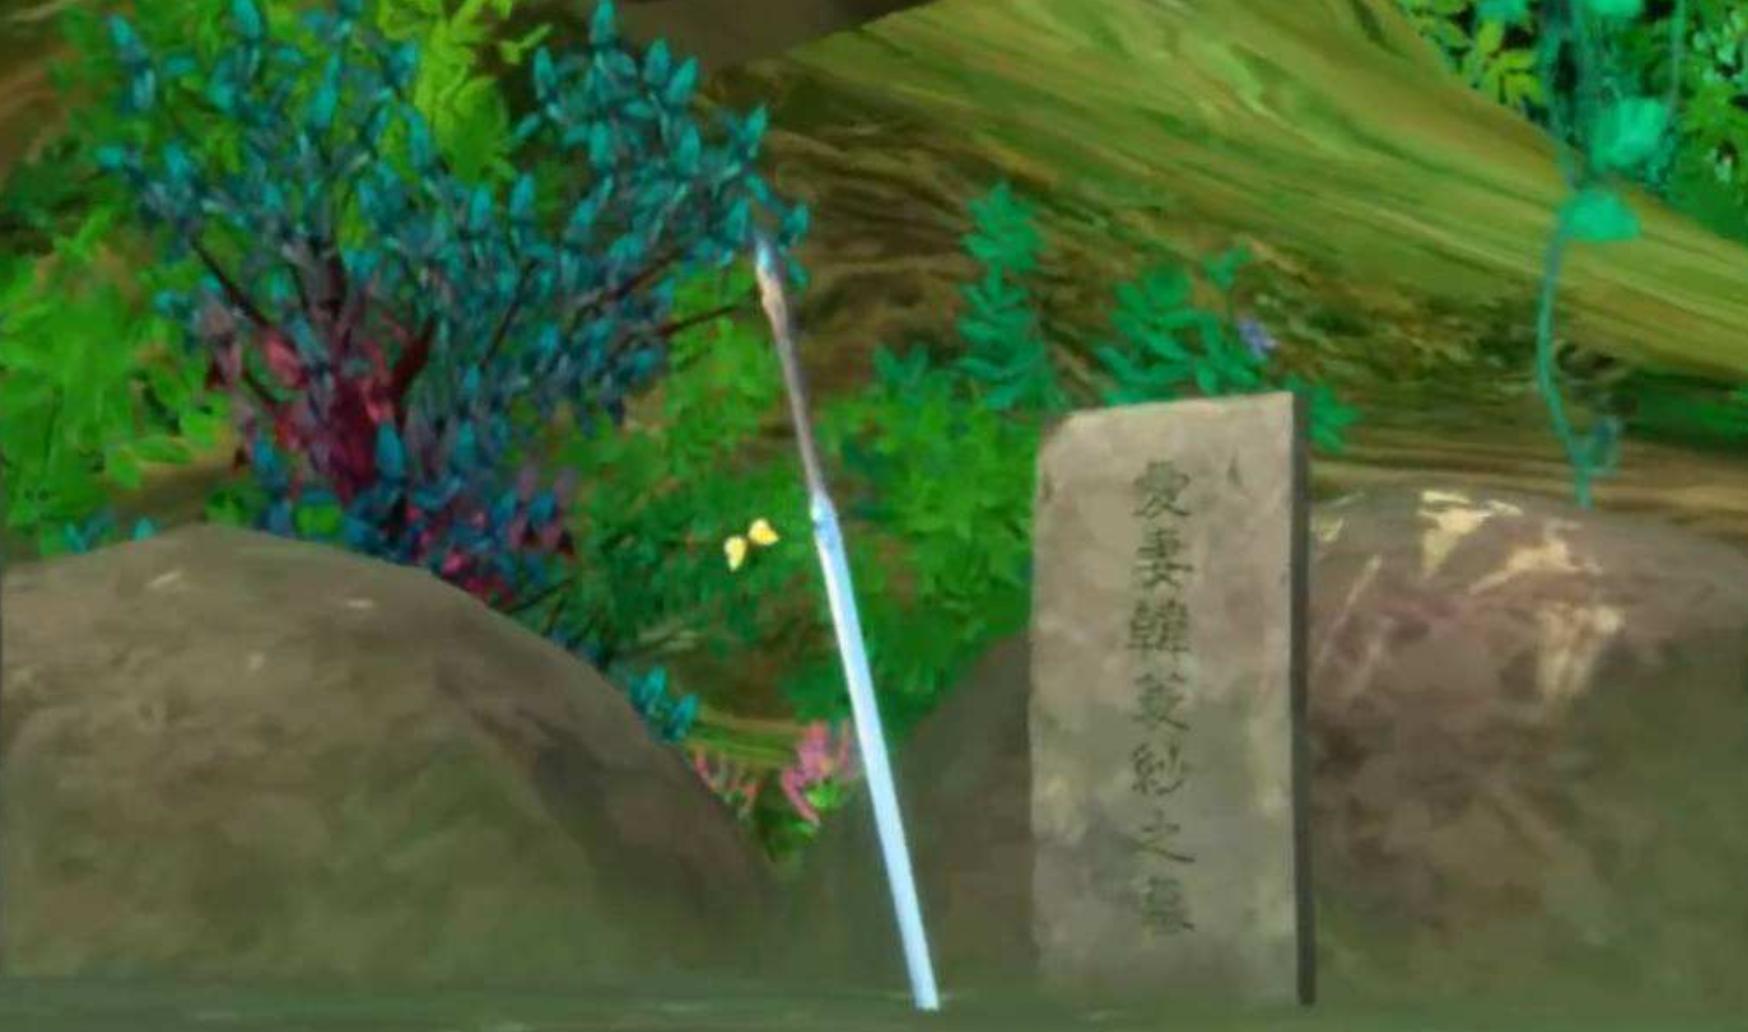 菱纱-墓碑.png